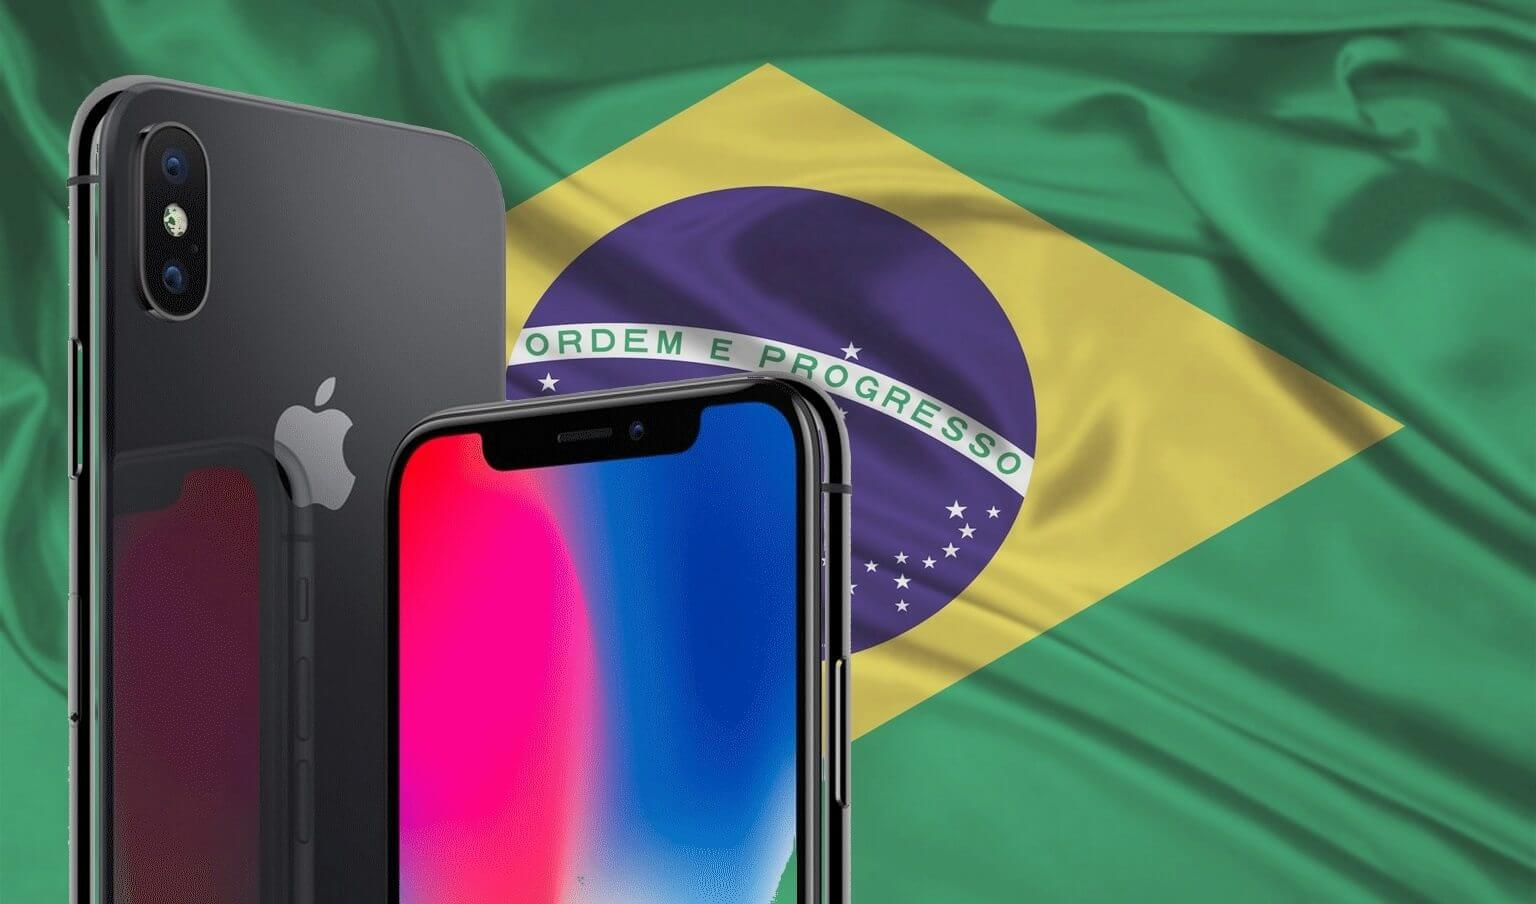 Polaroid Da Motorola Chega Ao Brasil Oficialmente Infomoney fb3a78f57e